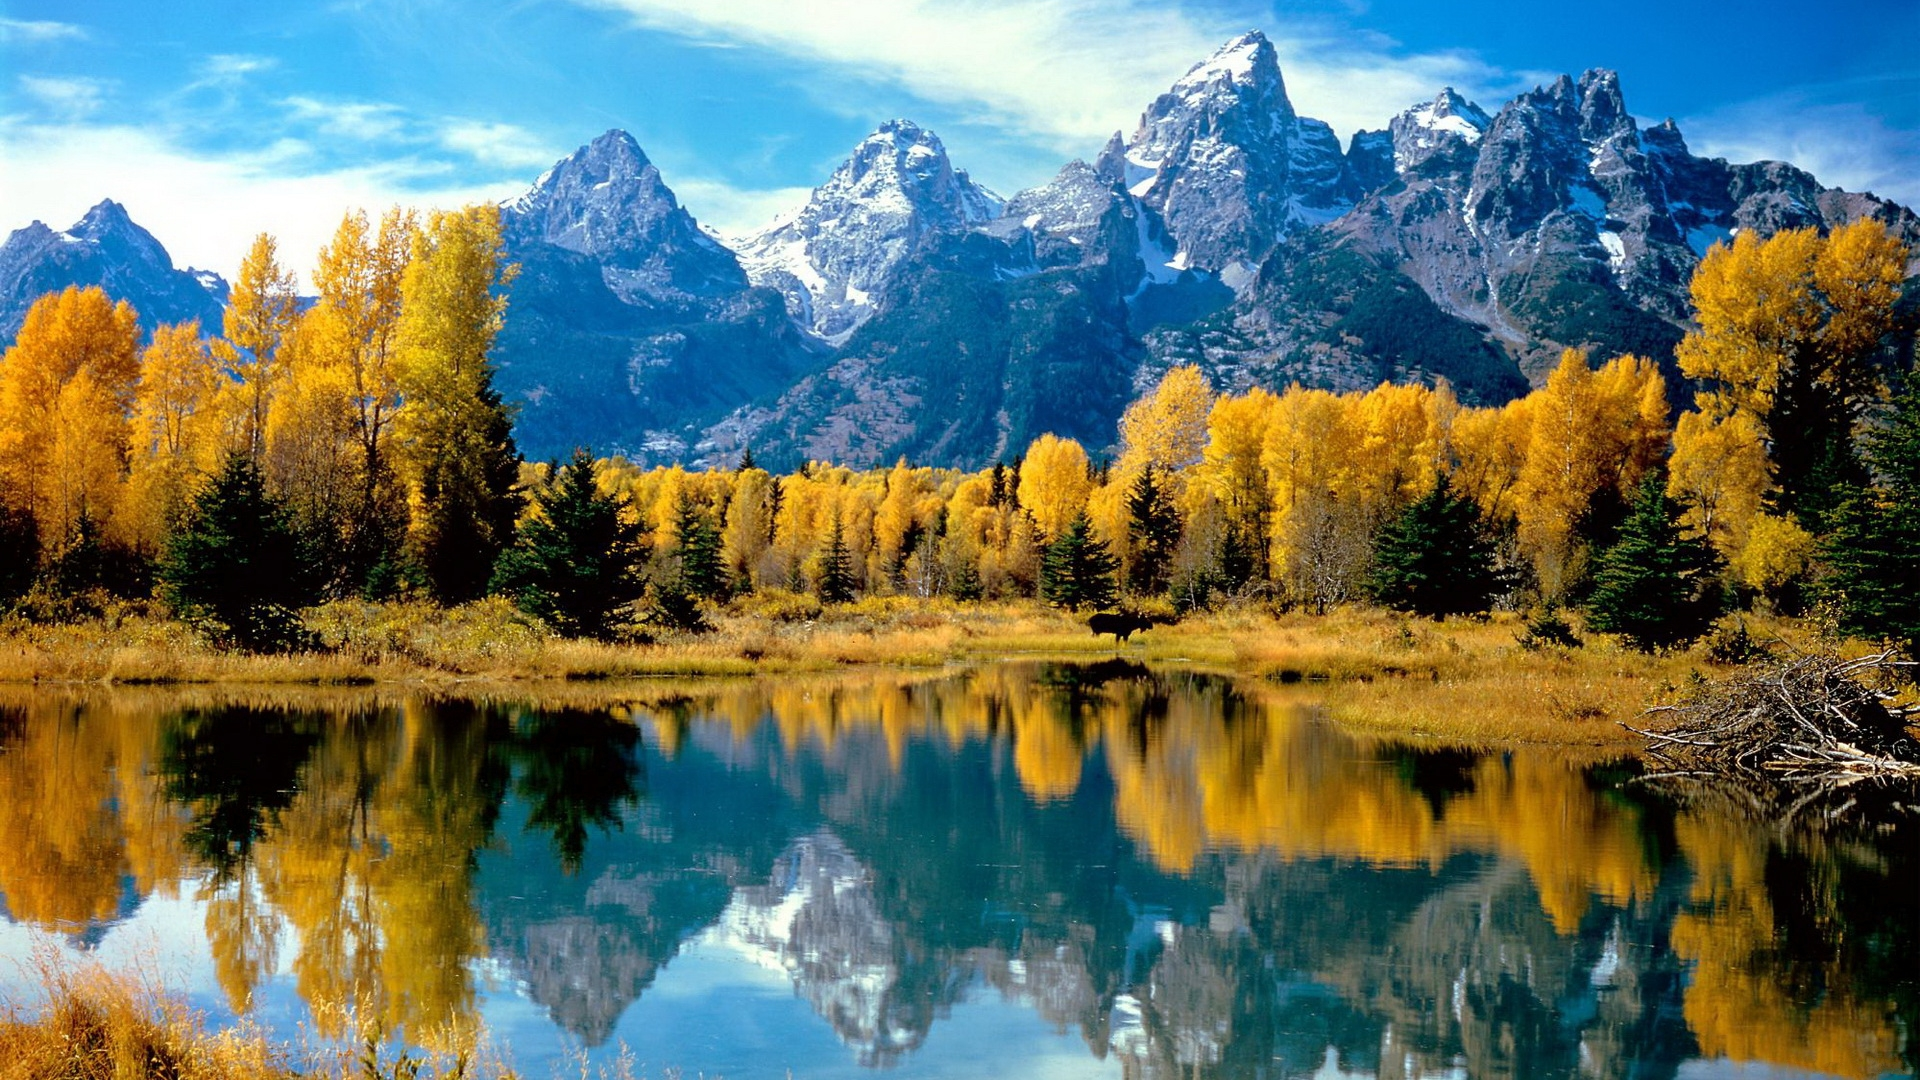 Hd Wallpaper 1080p 1080p Desktop Backgrounds Nature 127547 Hd Wallpaper Backgrounds Download